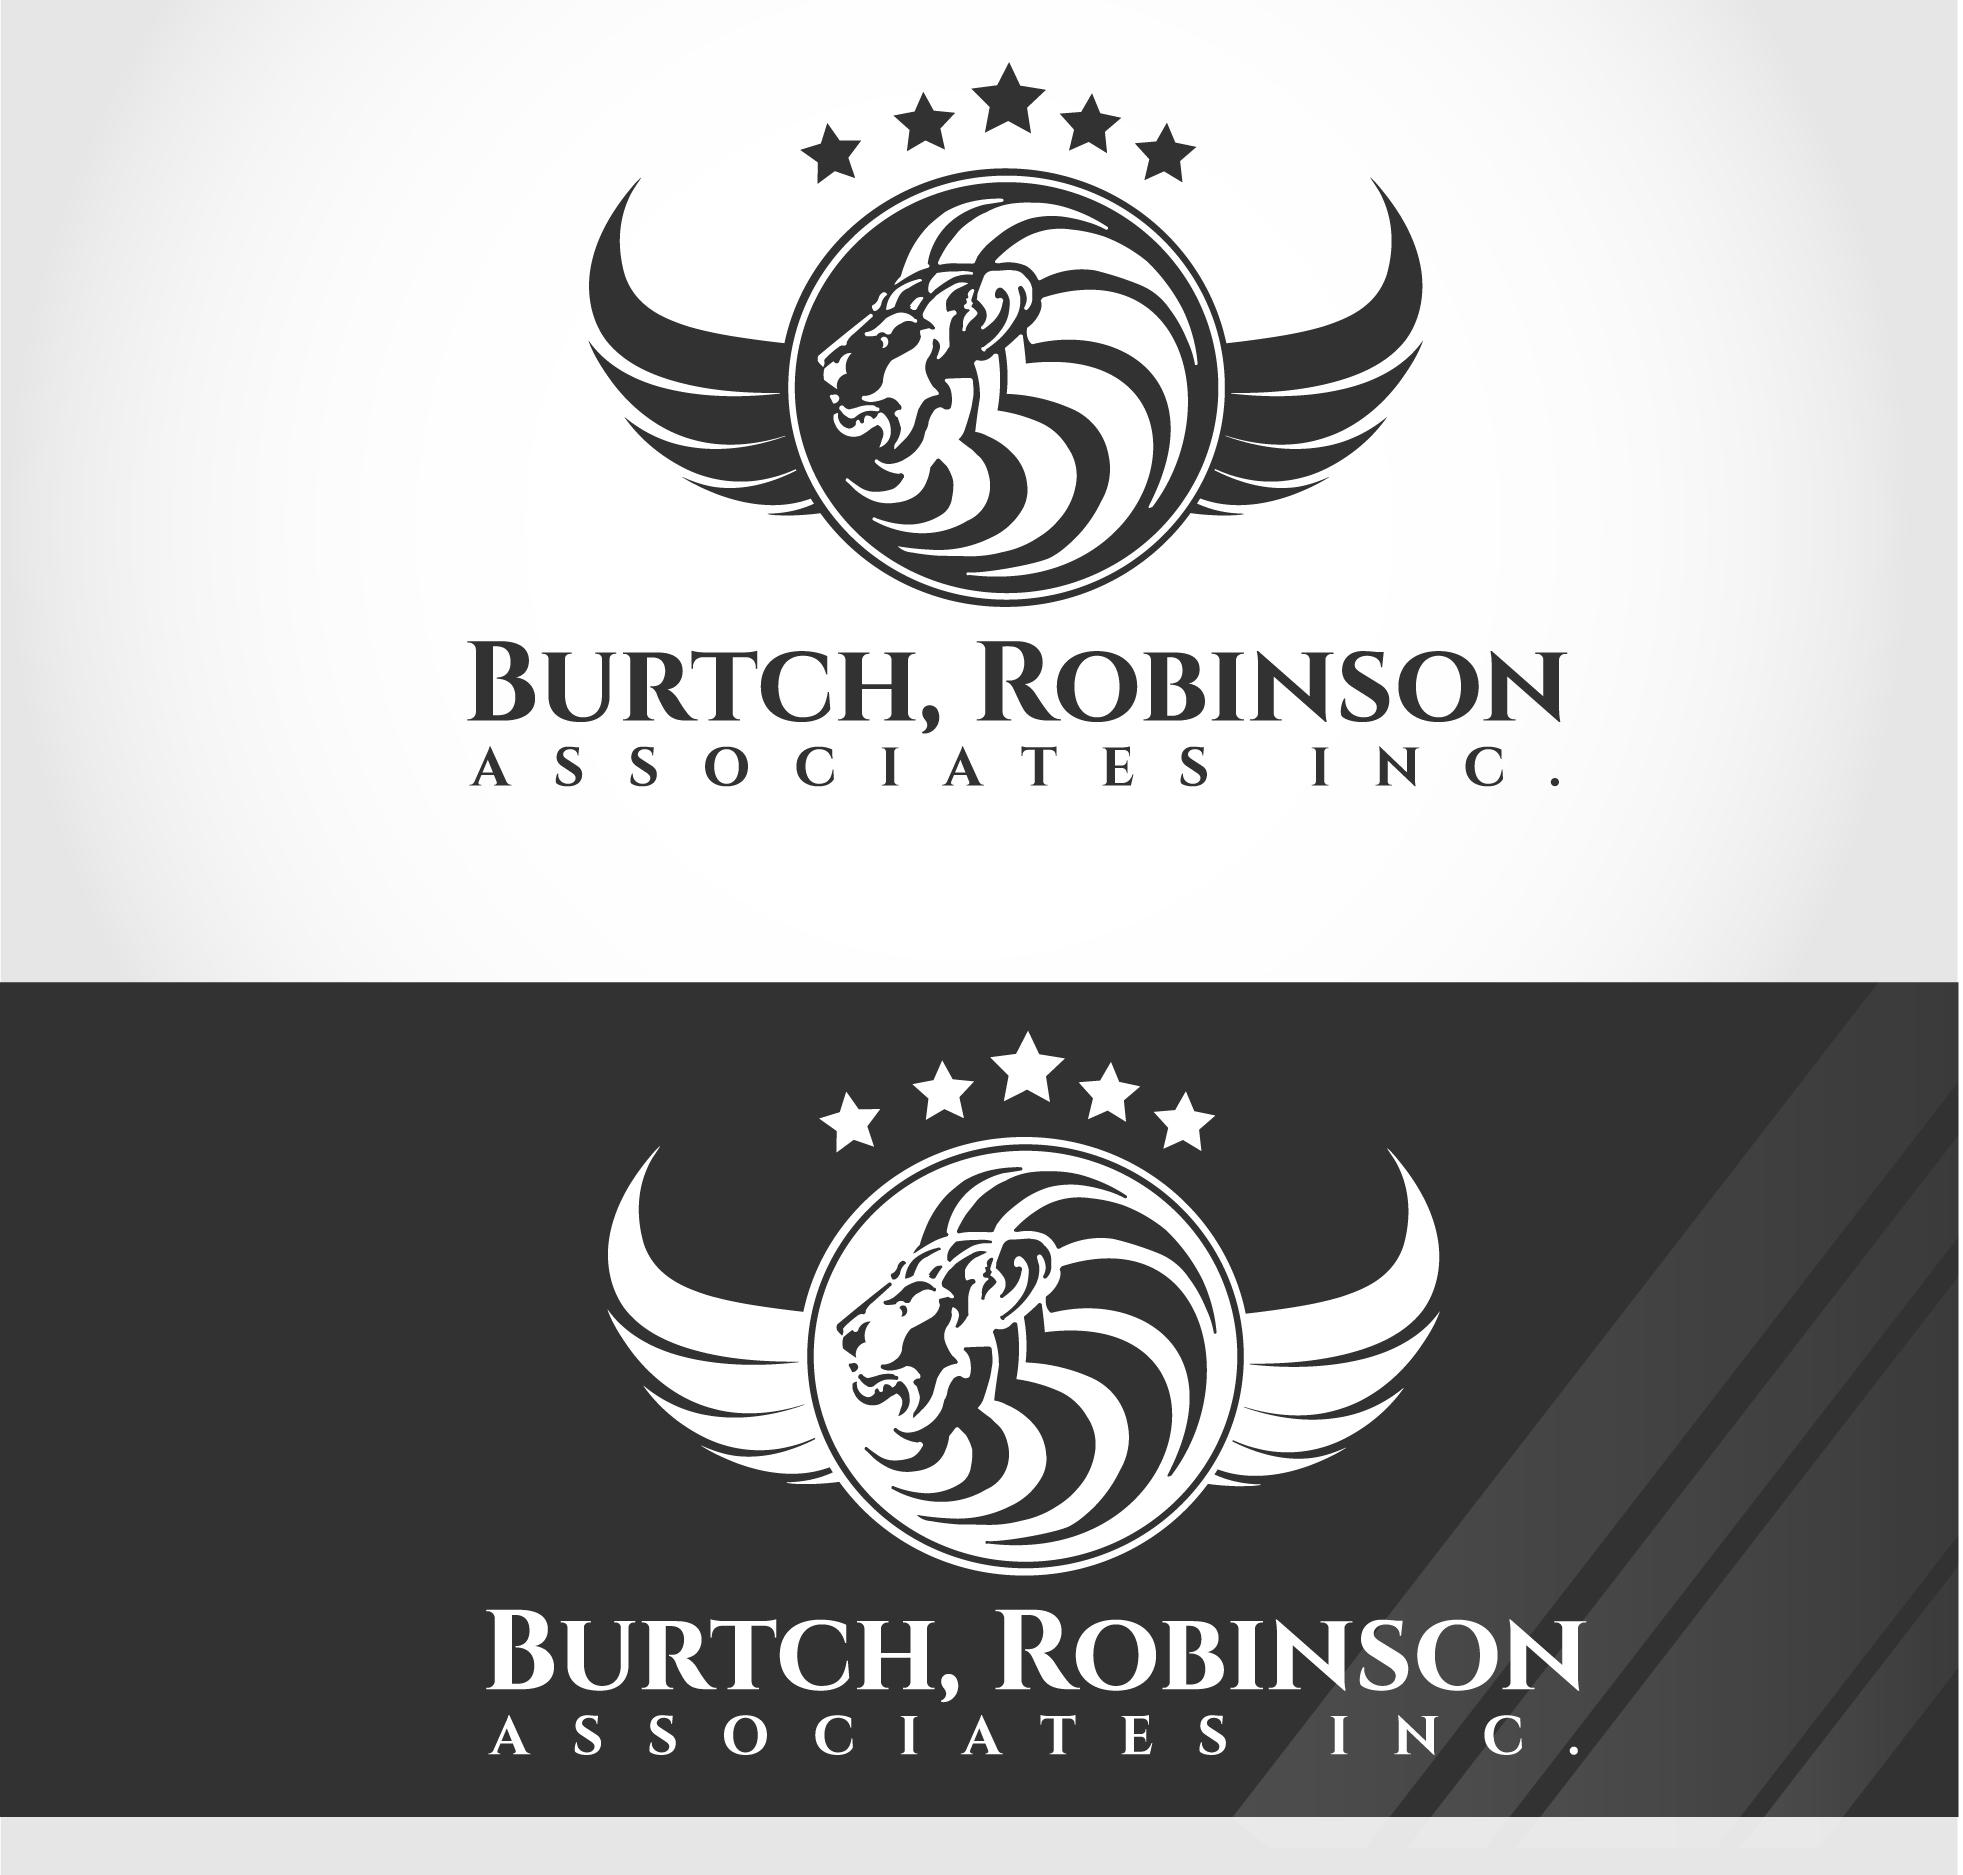 Logo Design by VENTSISLAV KOVACHEV - Entry No. 59 in the Logo Design Contest Unique Logo Design Wanted for Burtch, Robinson & Associates Inc..